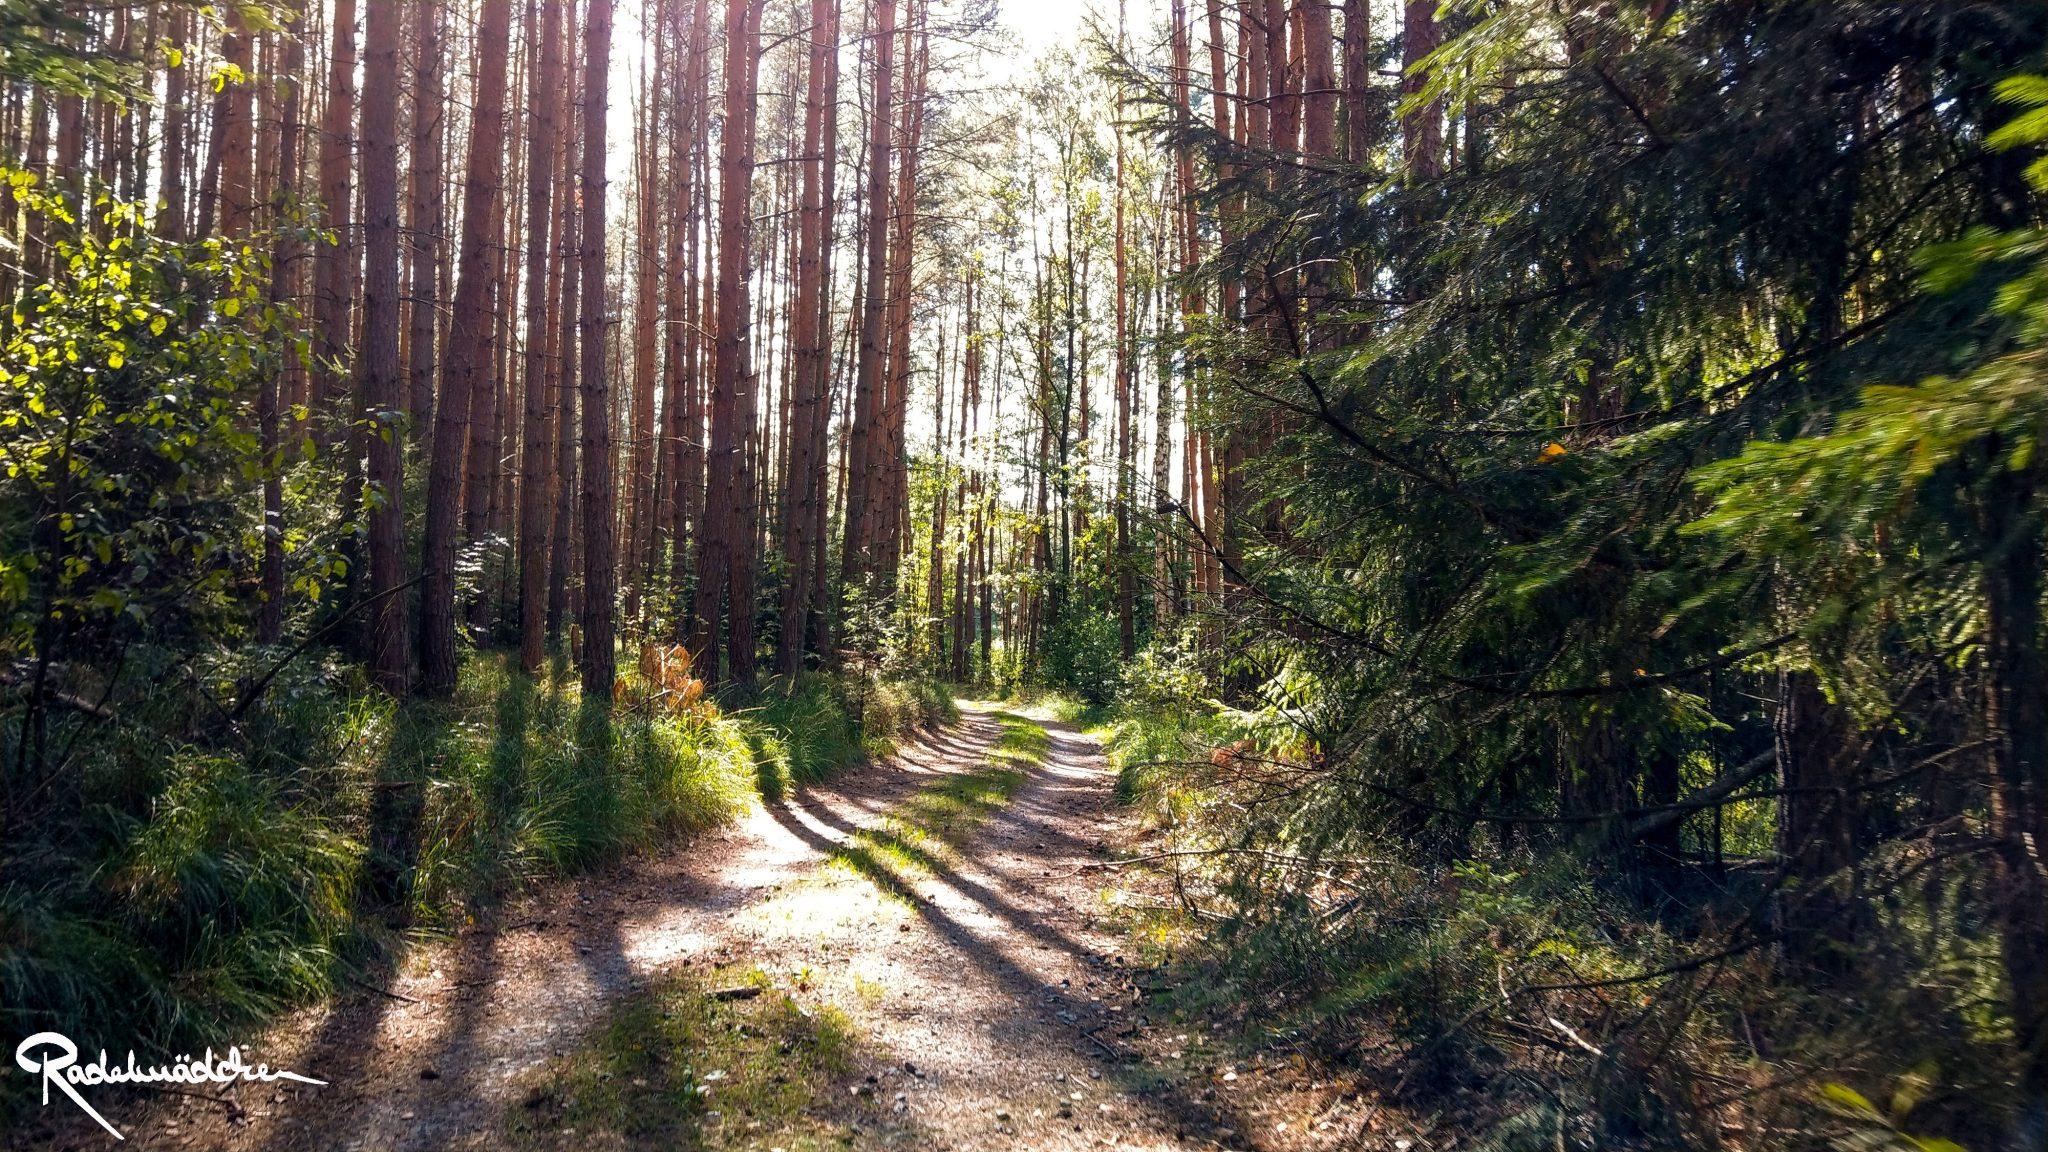 Waldmoment